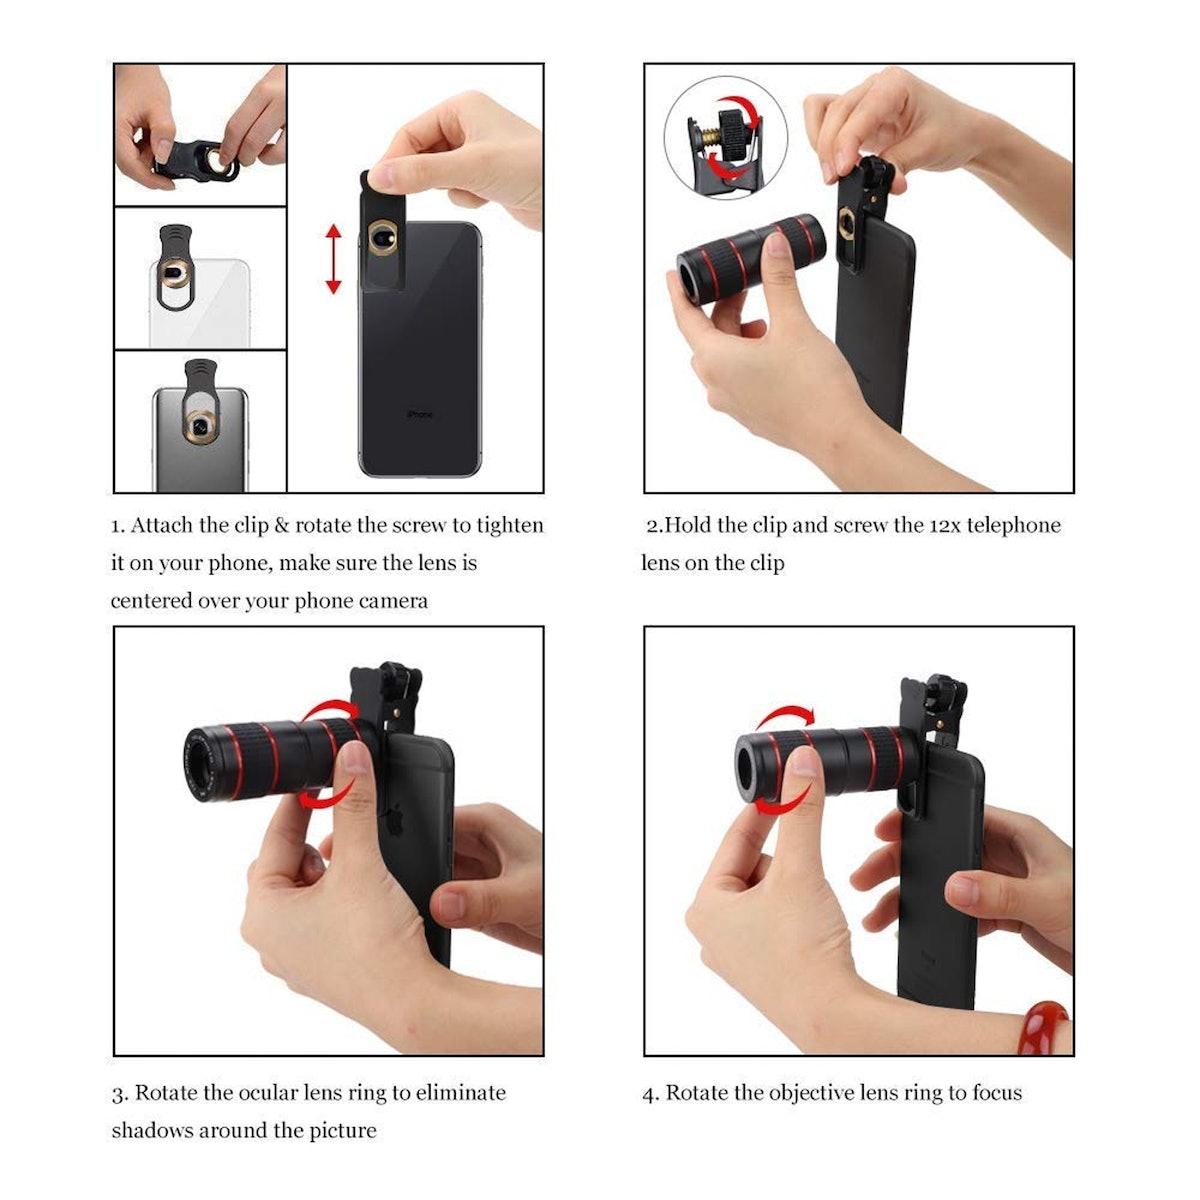 KNGUVTH Phone Camera Lens (5 Count)